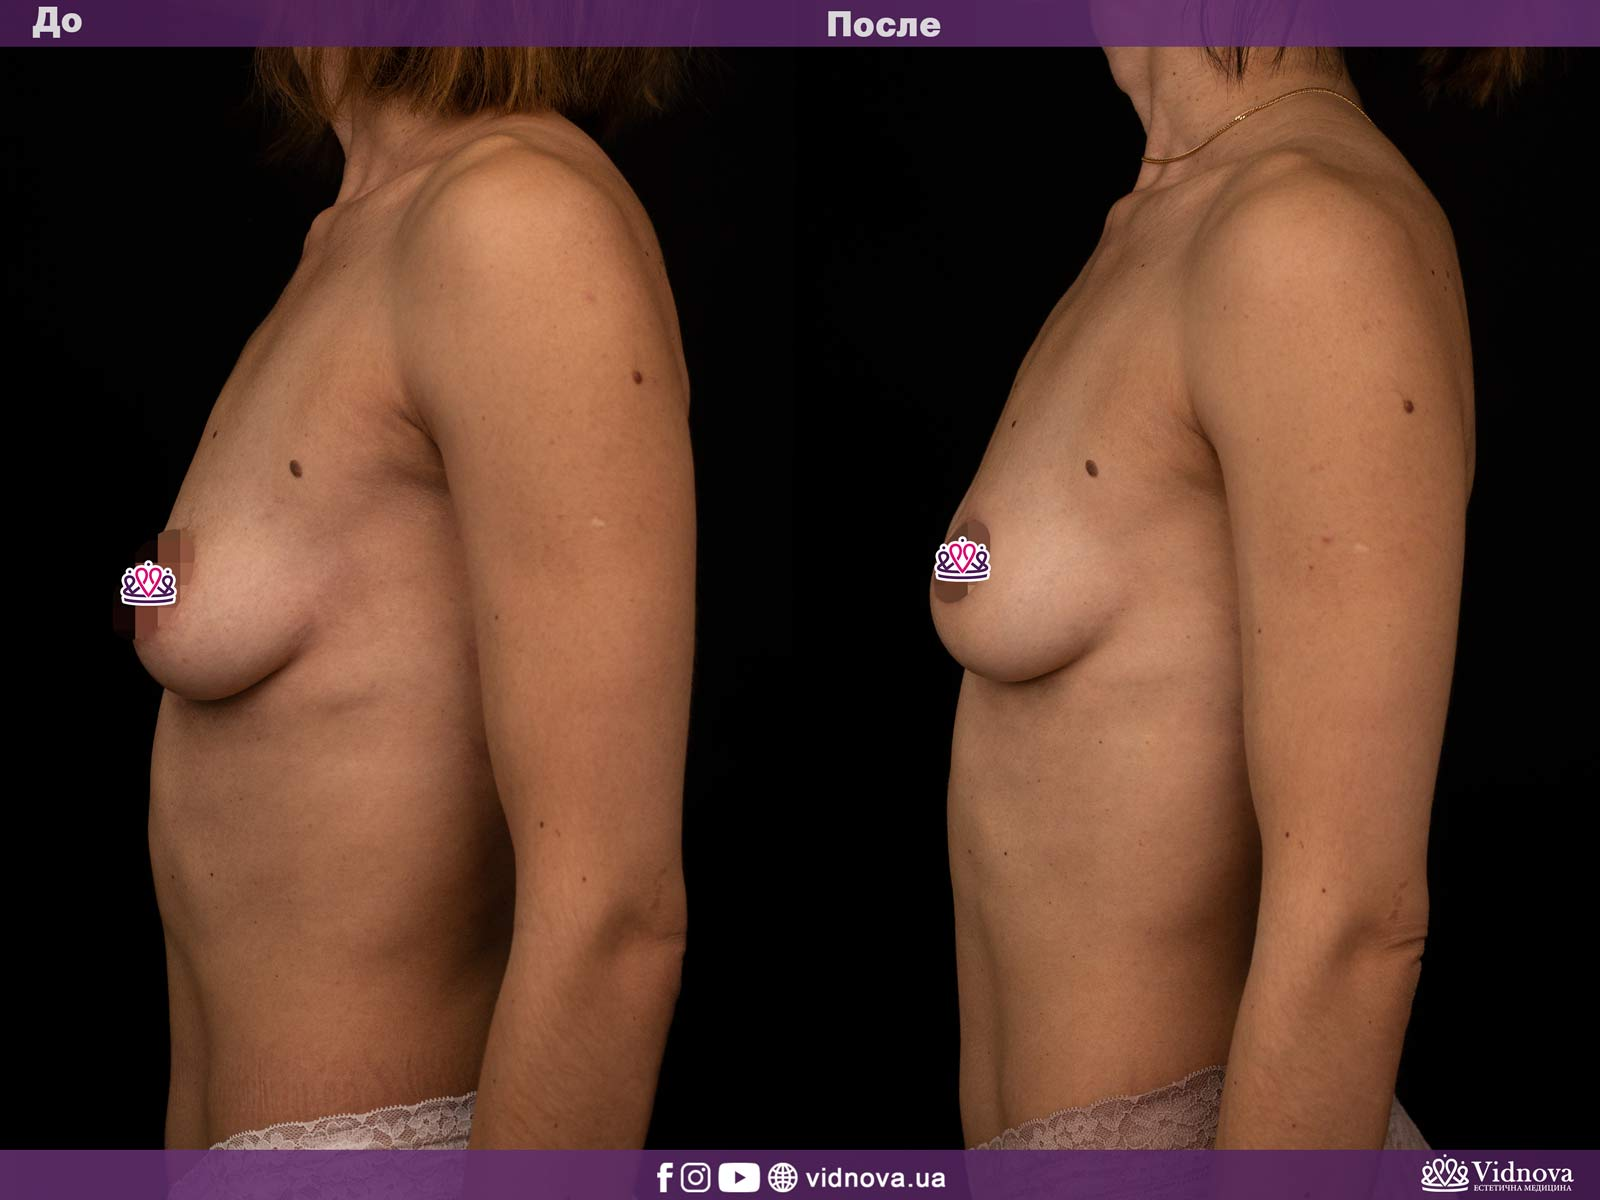 Подтяжка груди: Фото ДО и ПОСЛЕ - Пример №9-3 - Клиника Vidnova